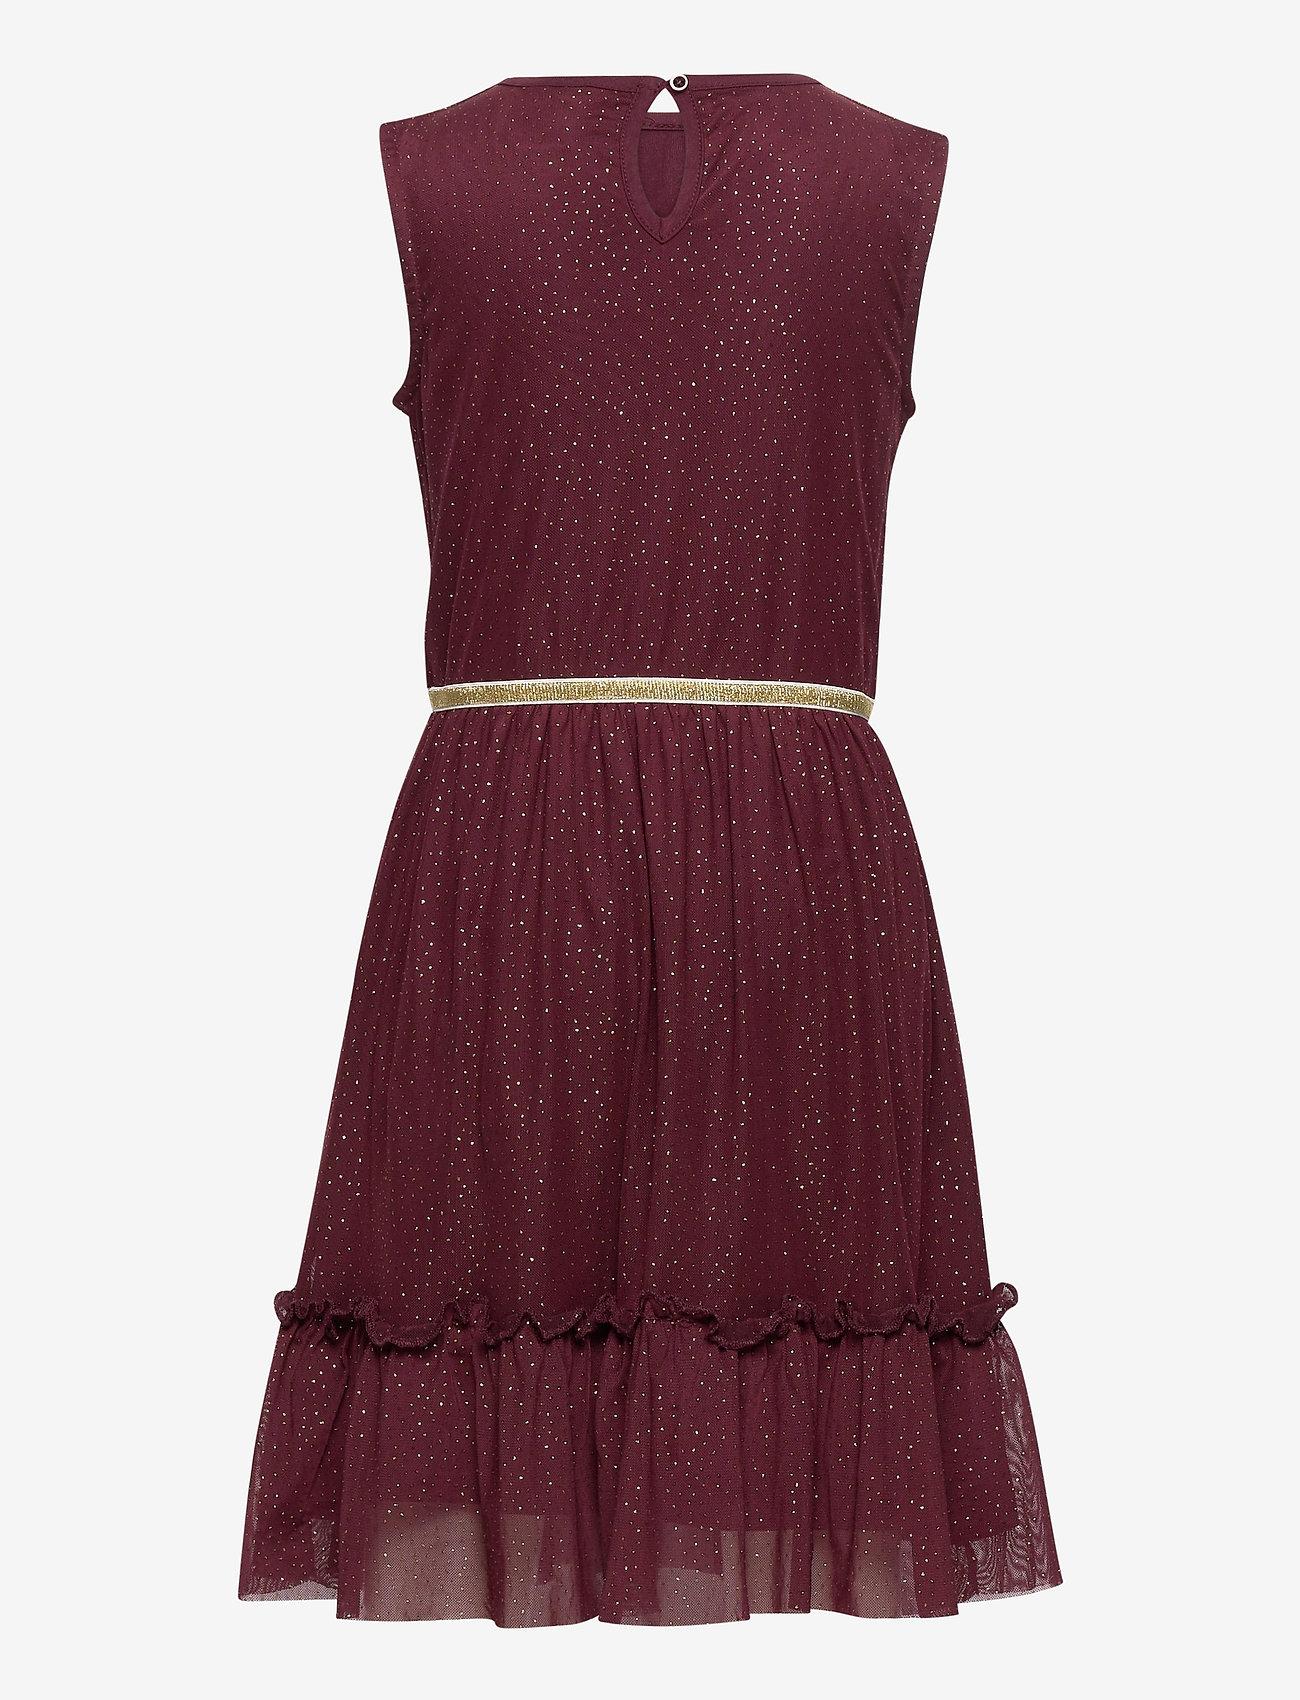 The New - ANNA RODESSA S_L DRESS - kjoler - sassafras - 1